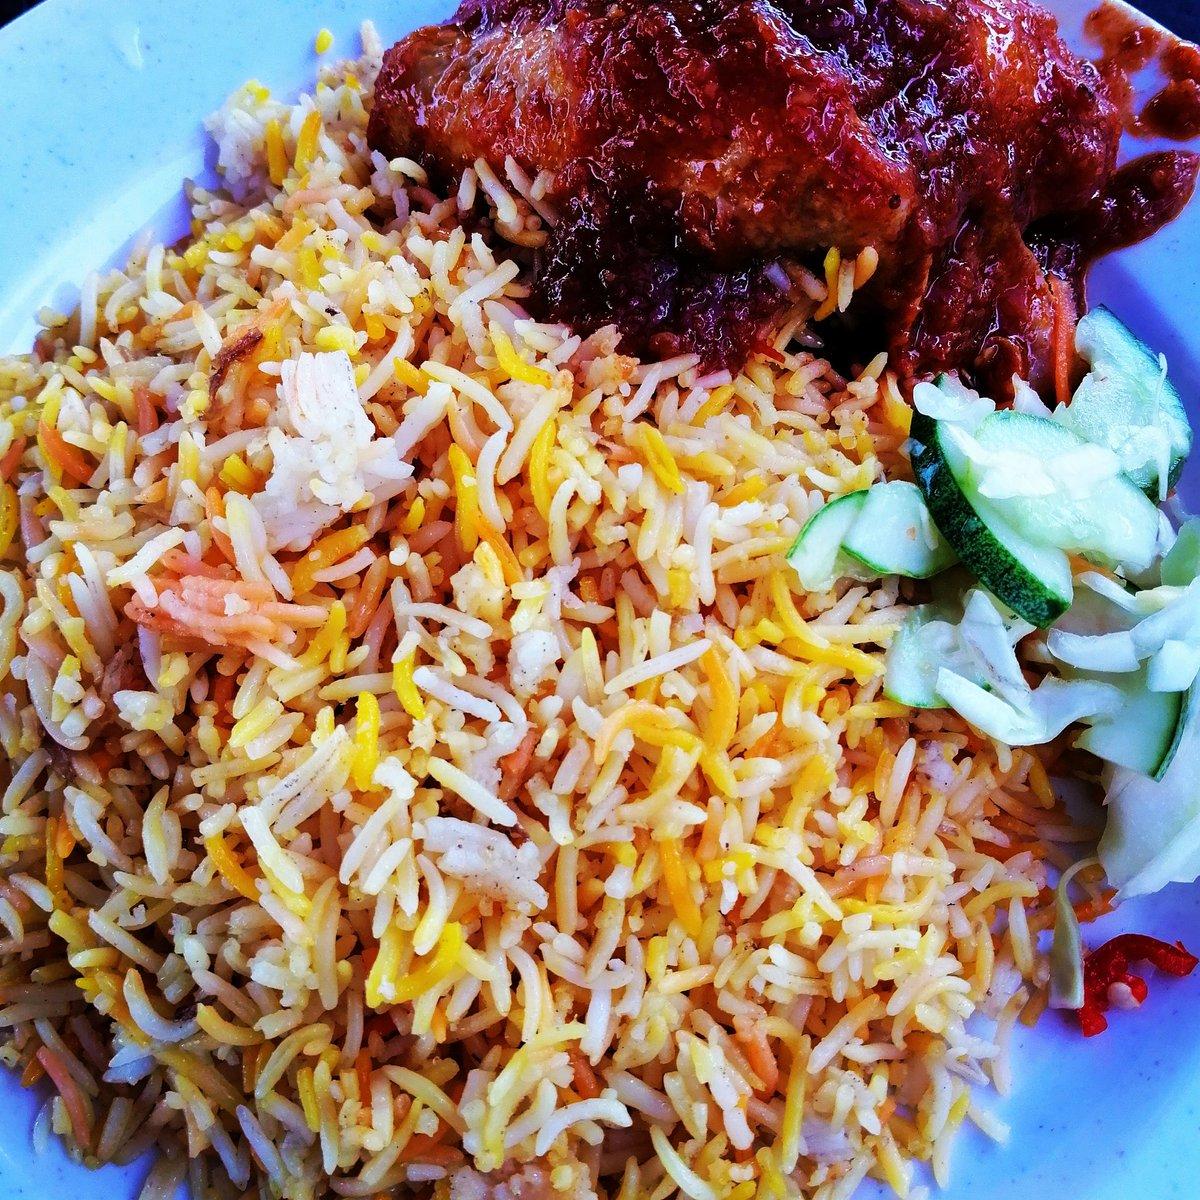 resepi nasi briyani ayam madu nasi ayam paris versi mama pagina inicial facebook Resepi Nasi Ayam Madu Paris Enak dan Mudah